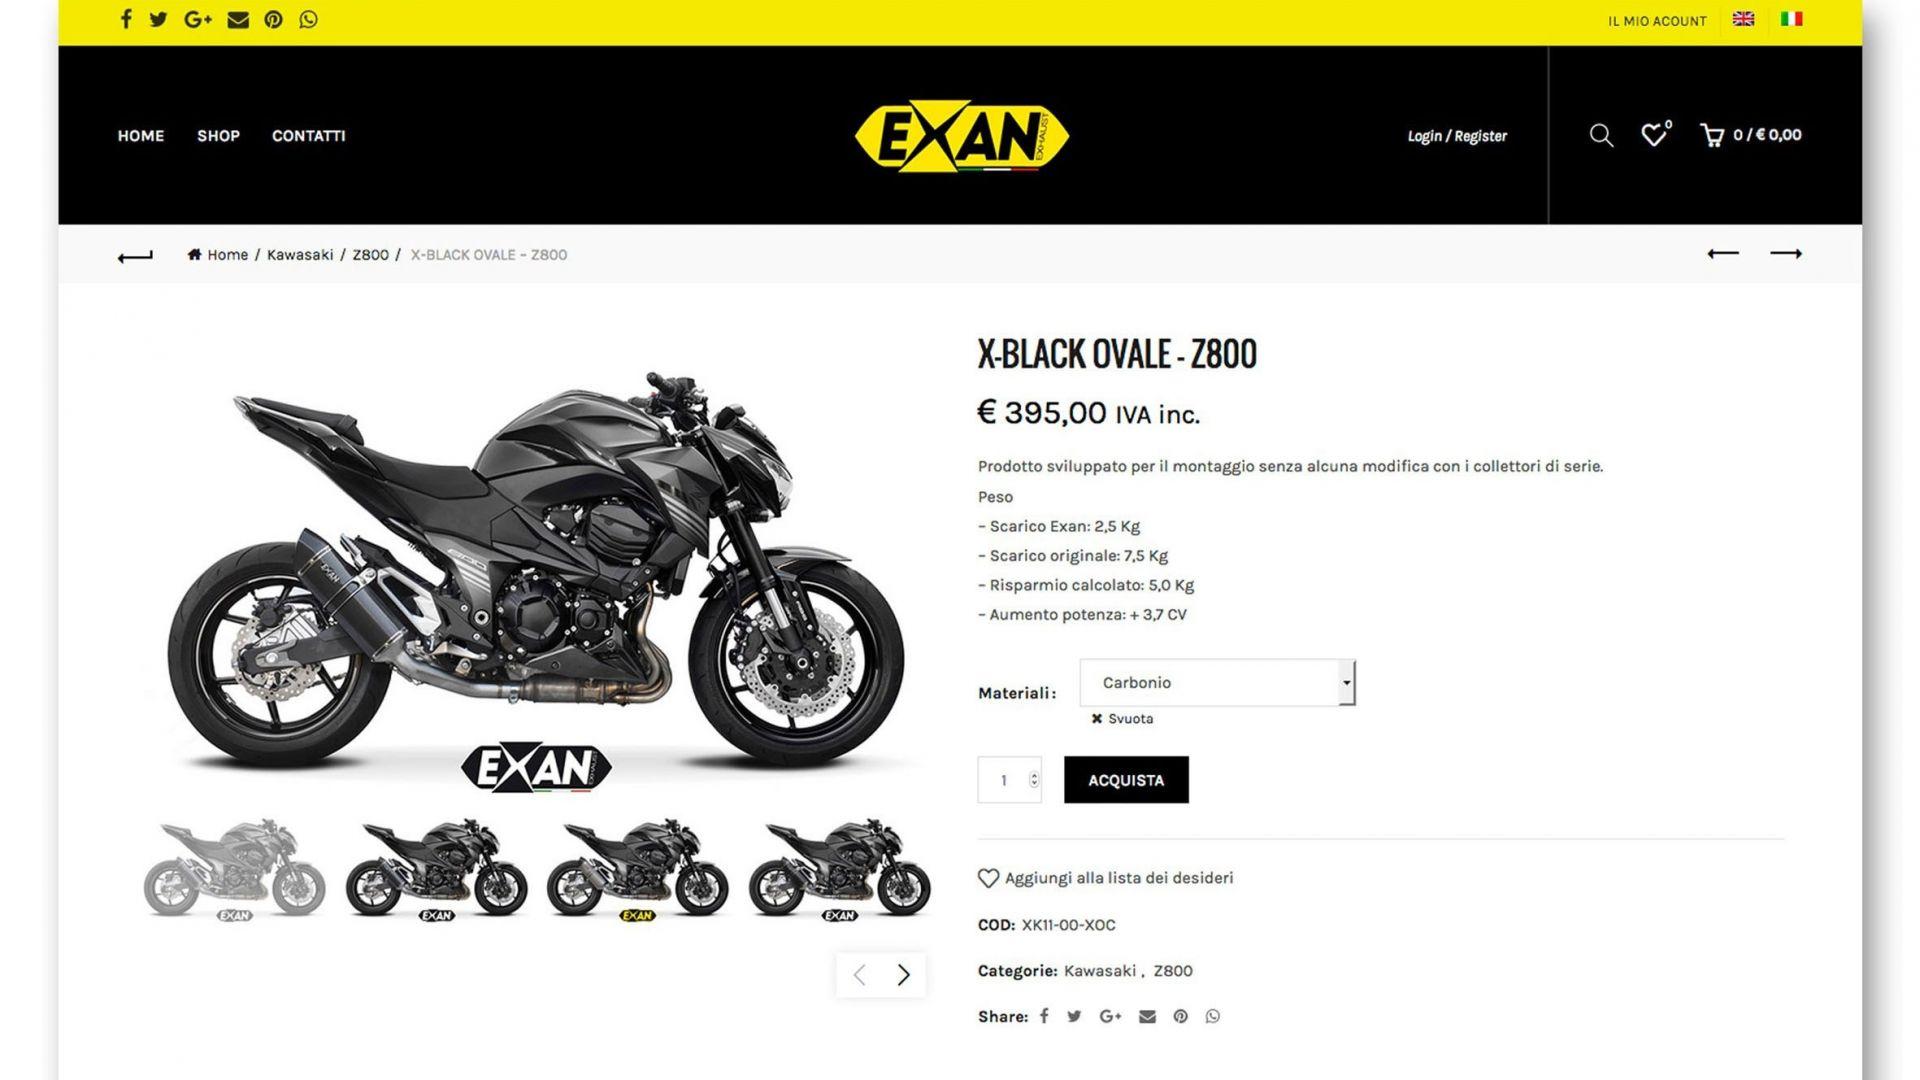 8275E LEOVINCE LV ONE EVO SLIP-ON YAMAHA XT1200Z XT 1200 Z SUPER TENERE - Ricambi Moto Lo Piccolo